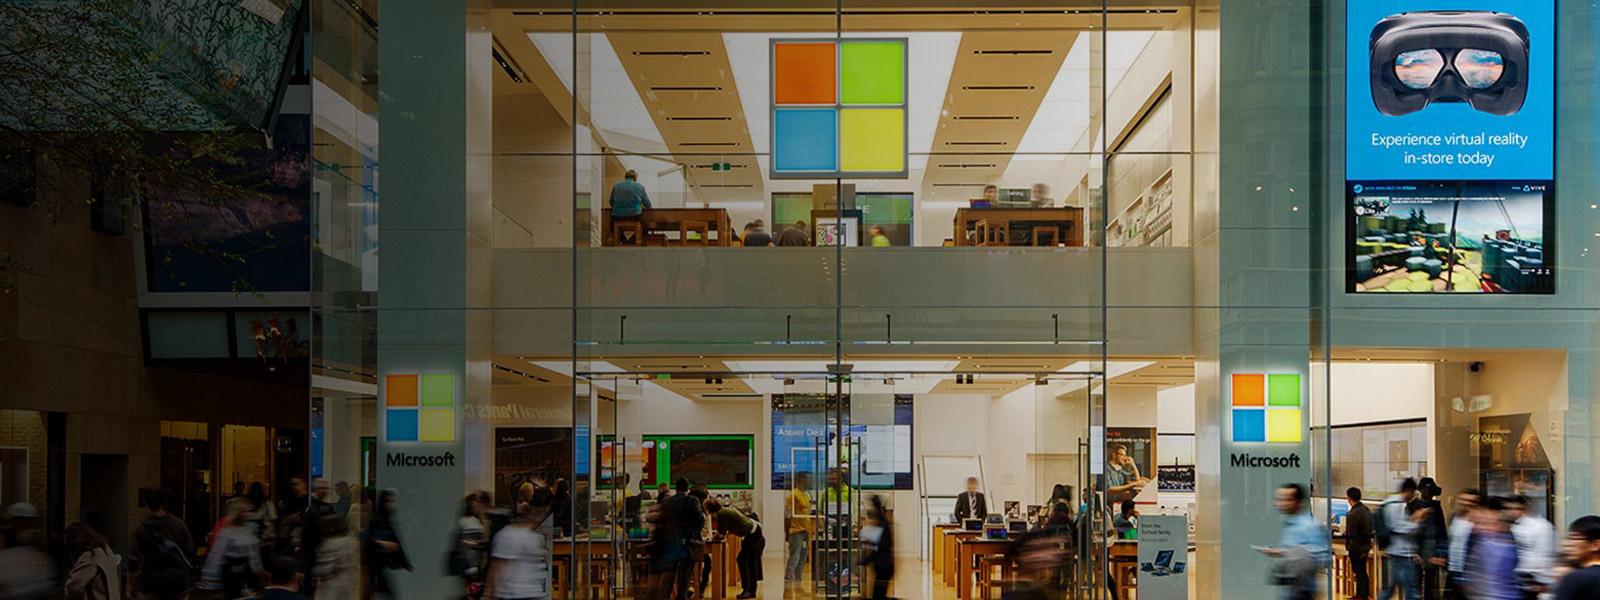 Microsoft Retail Store